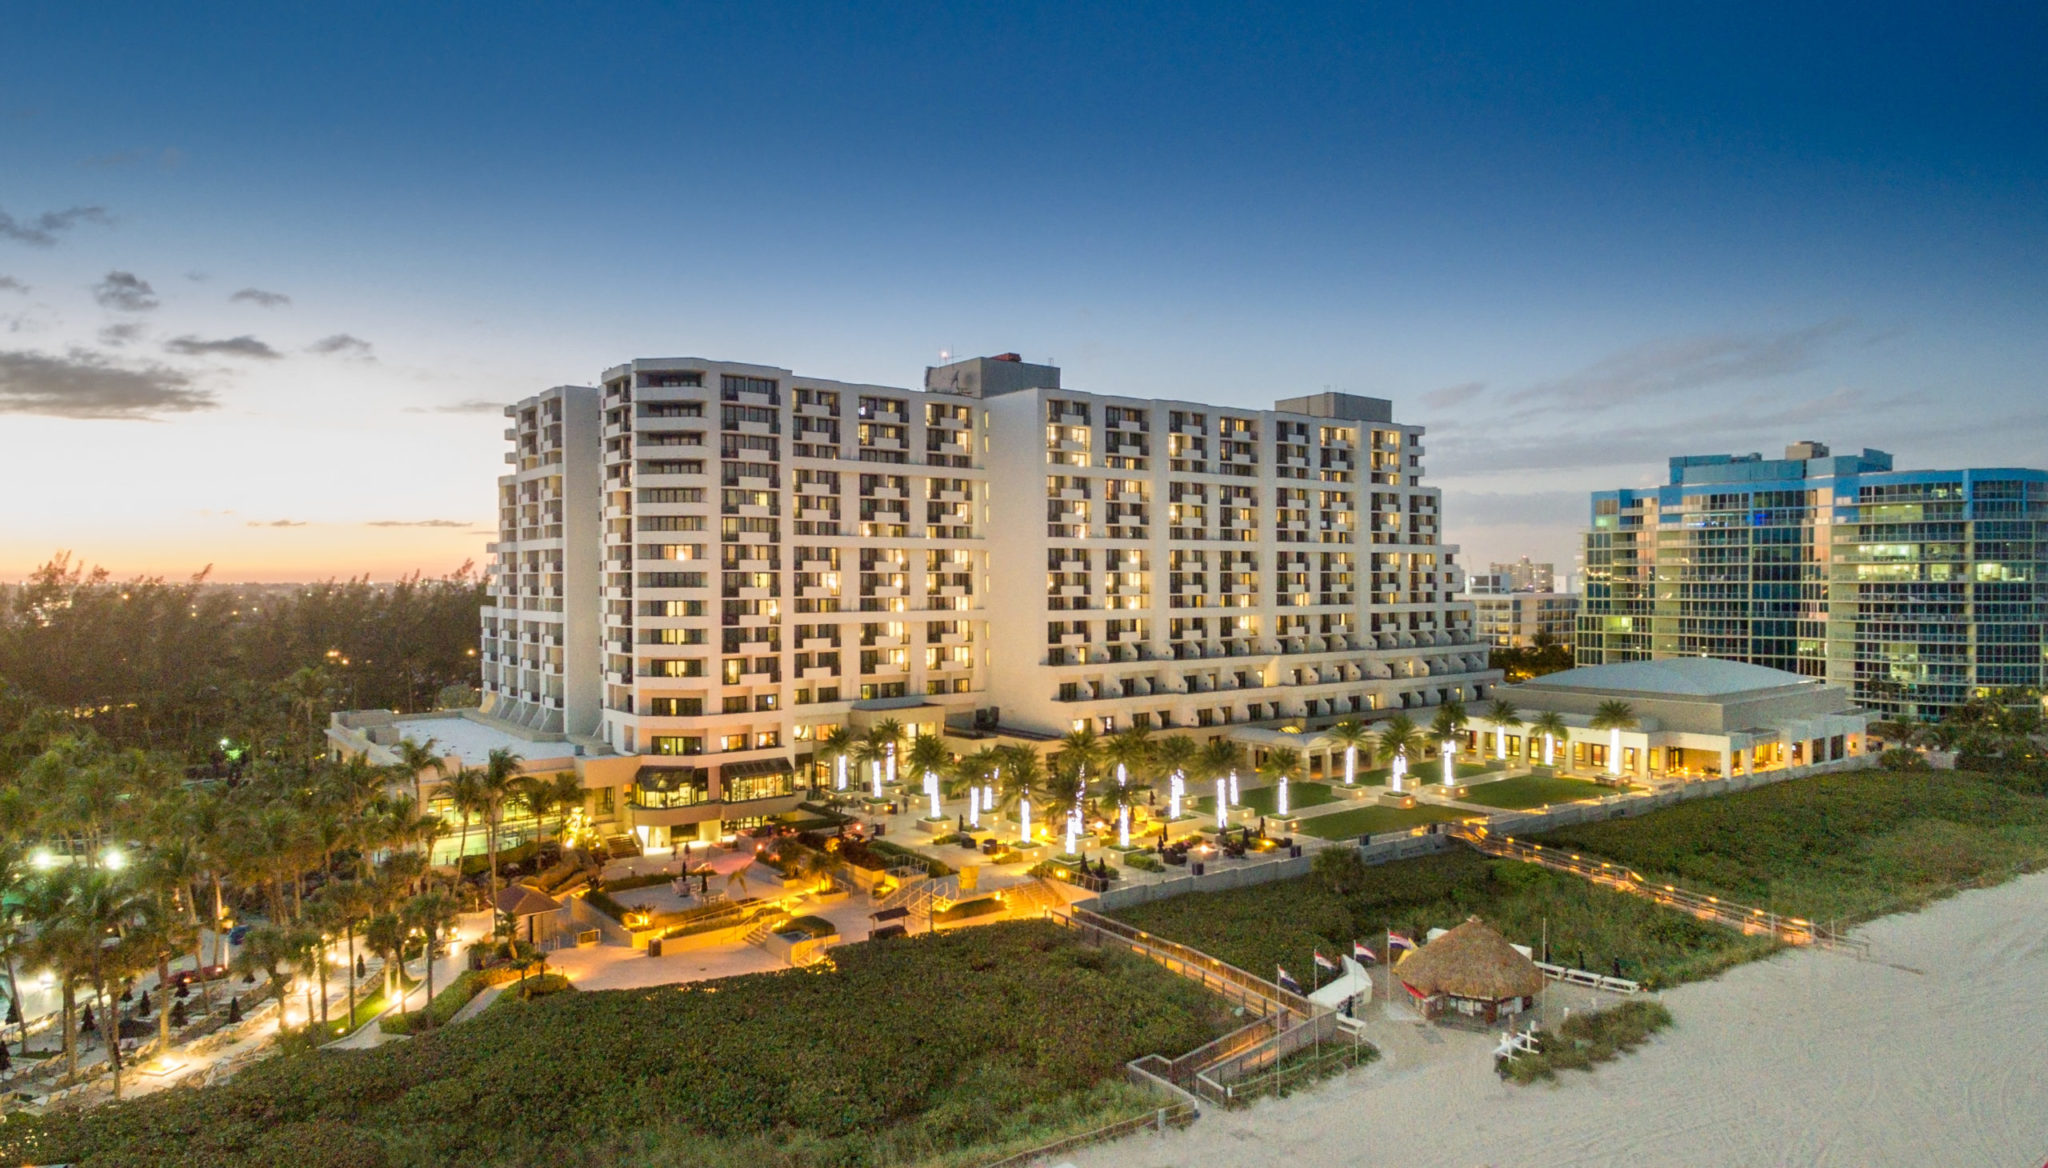 Fort Lauderdale Marriott Harbor Beach Resort & Spa